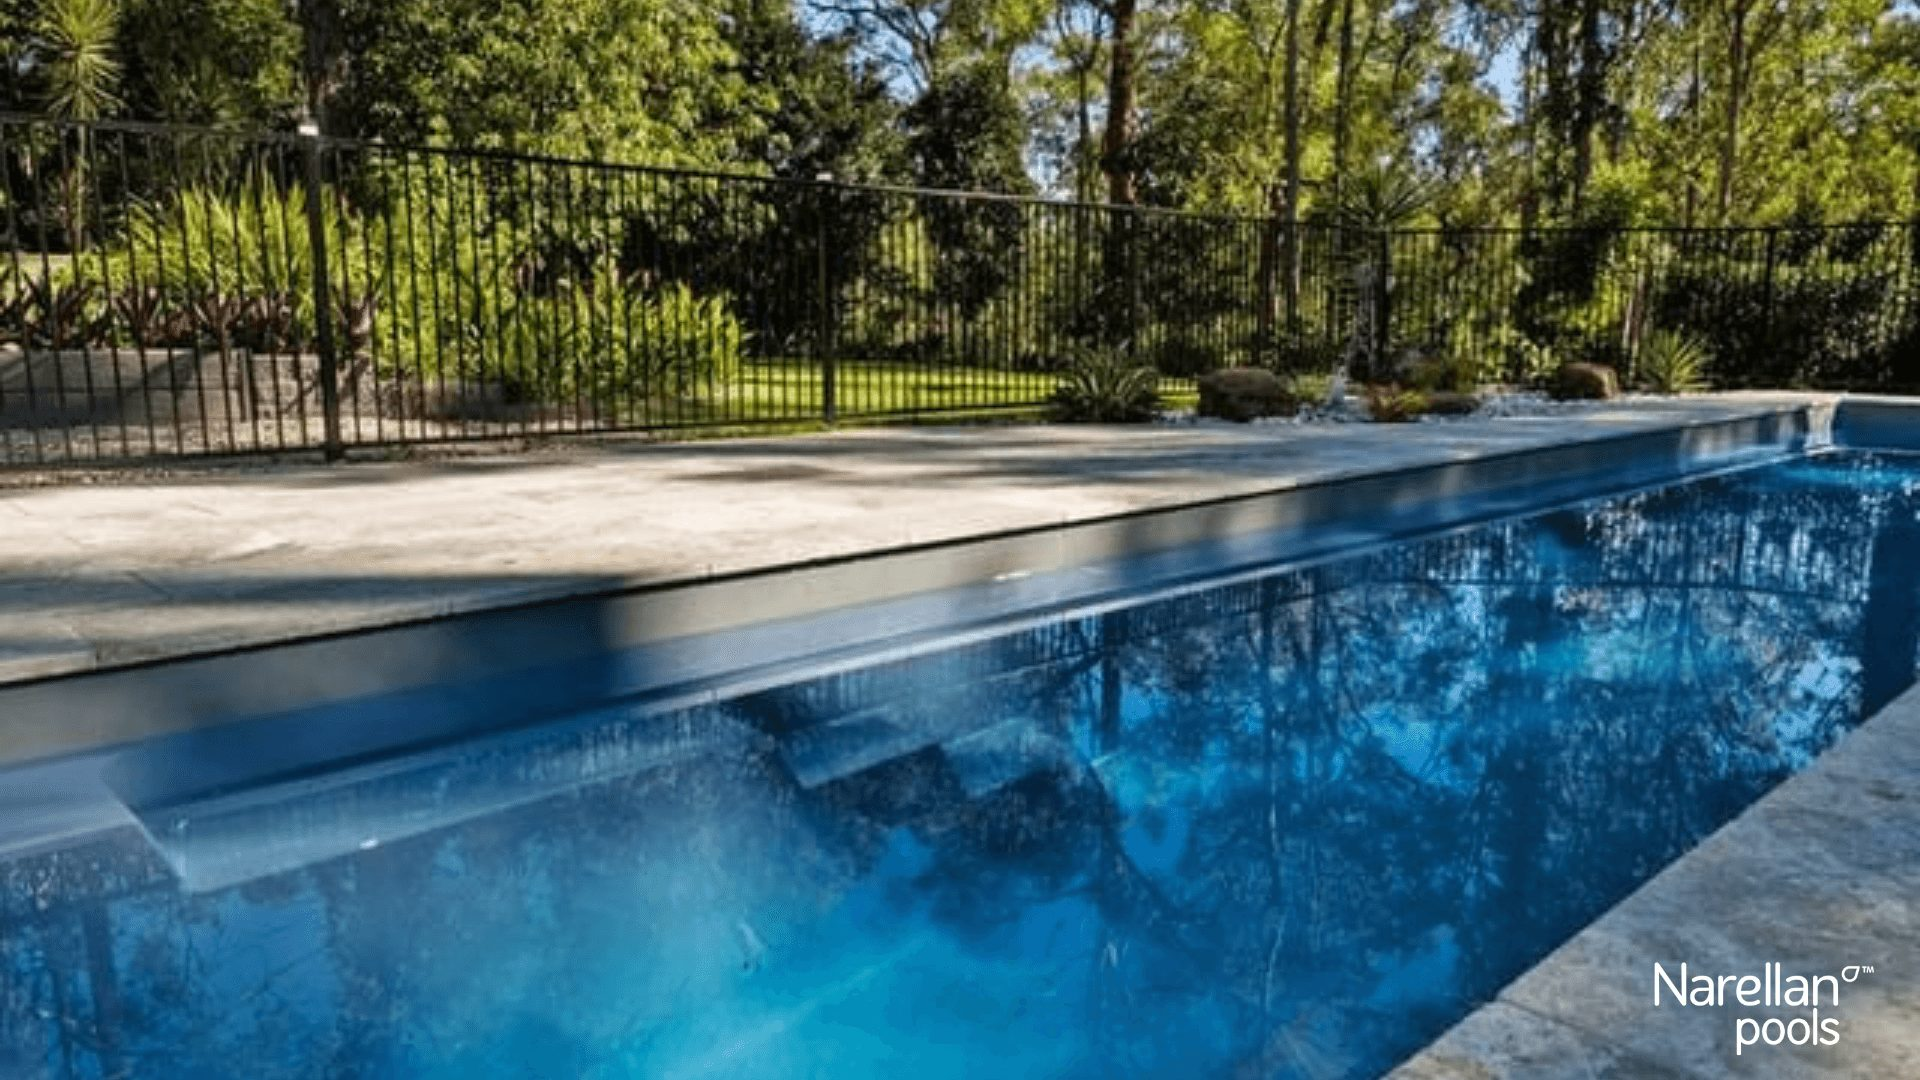 Panama piscine creusée tendances 2021 de nage fibre de verre Ladouceur paysagiste